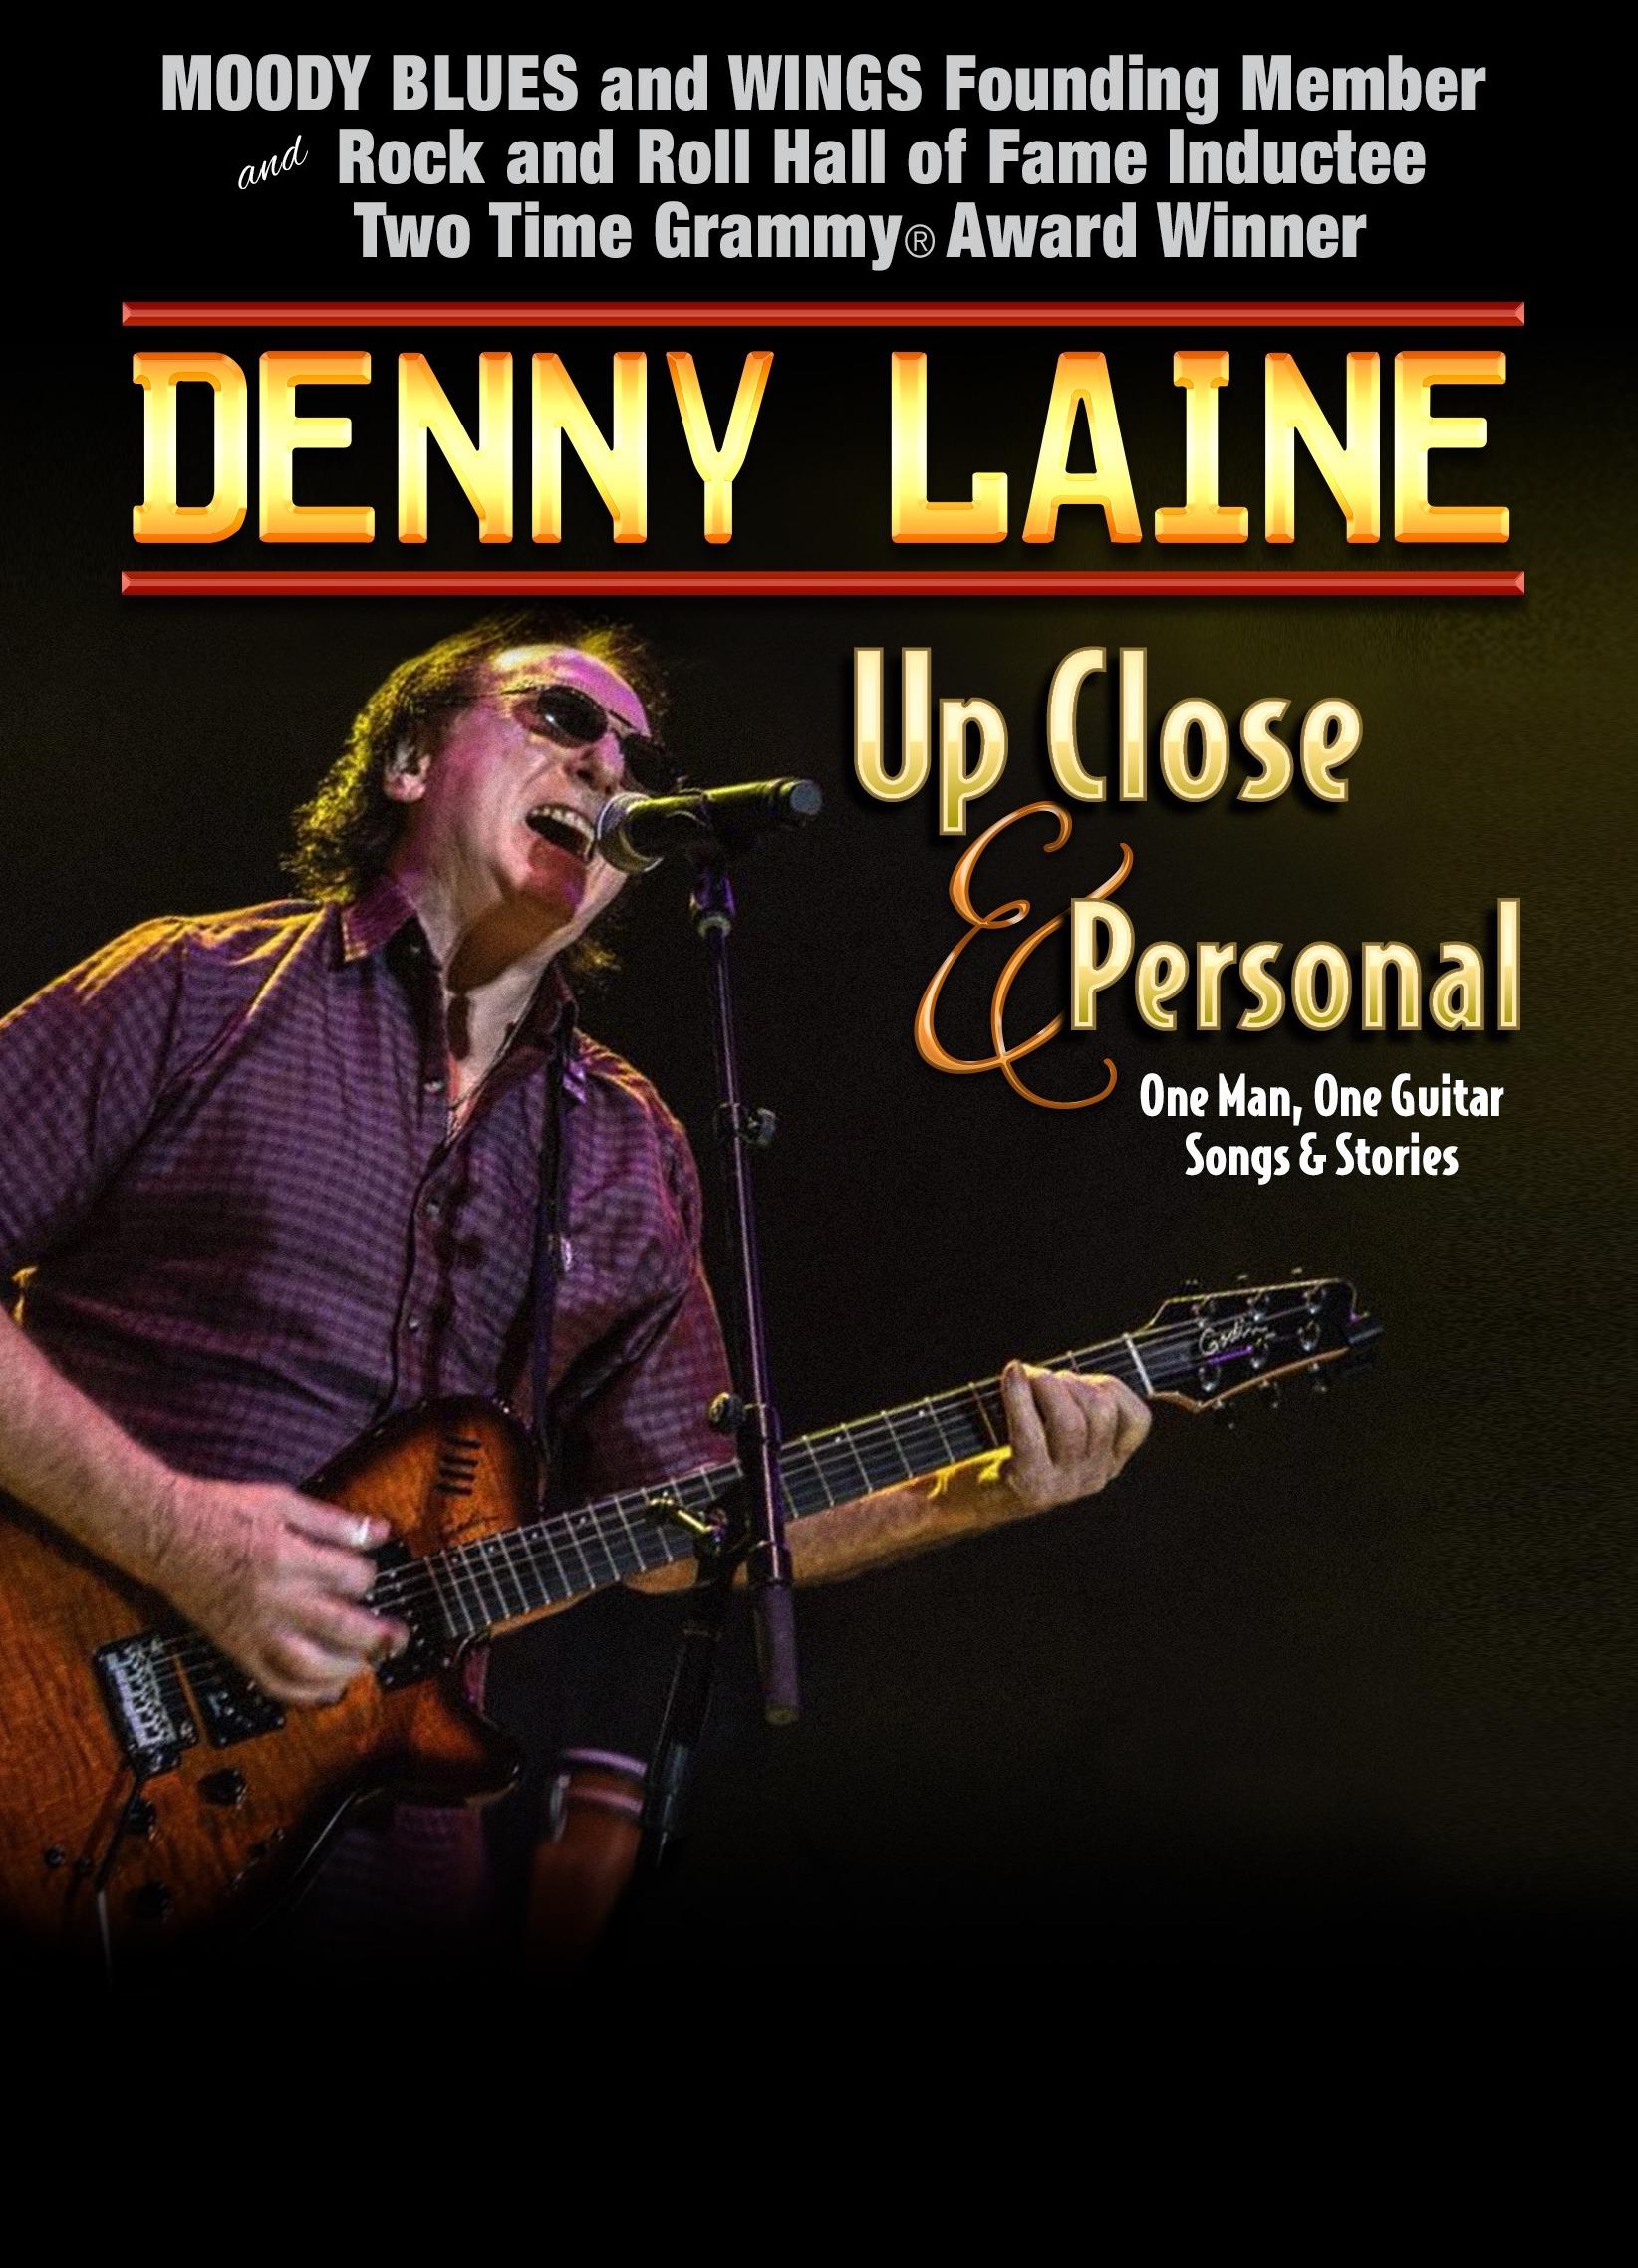 DennyLaineUpClose.jpg